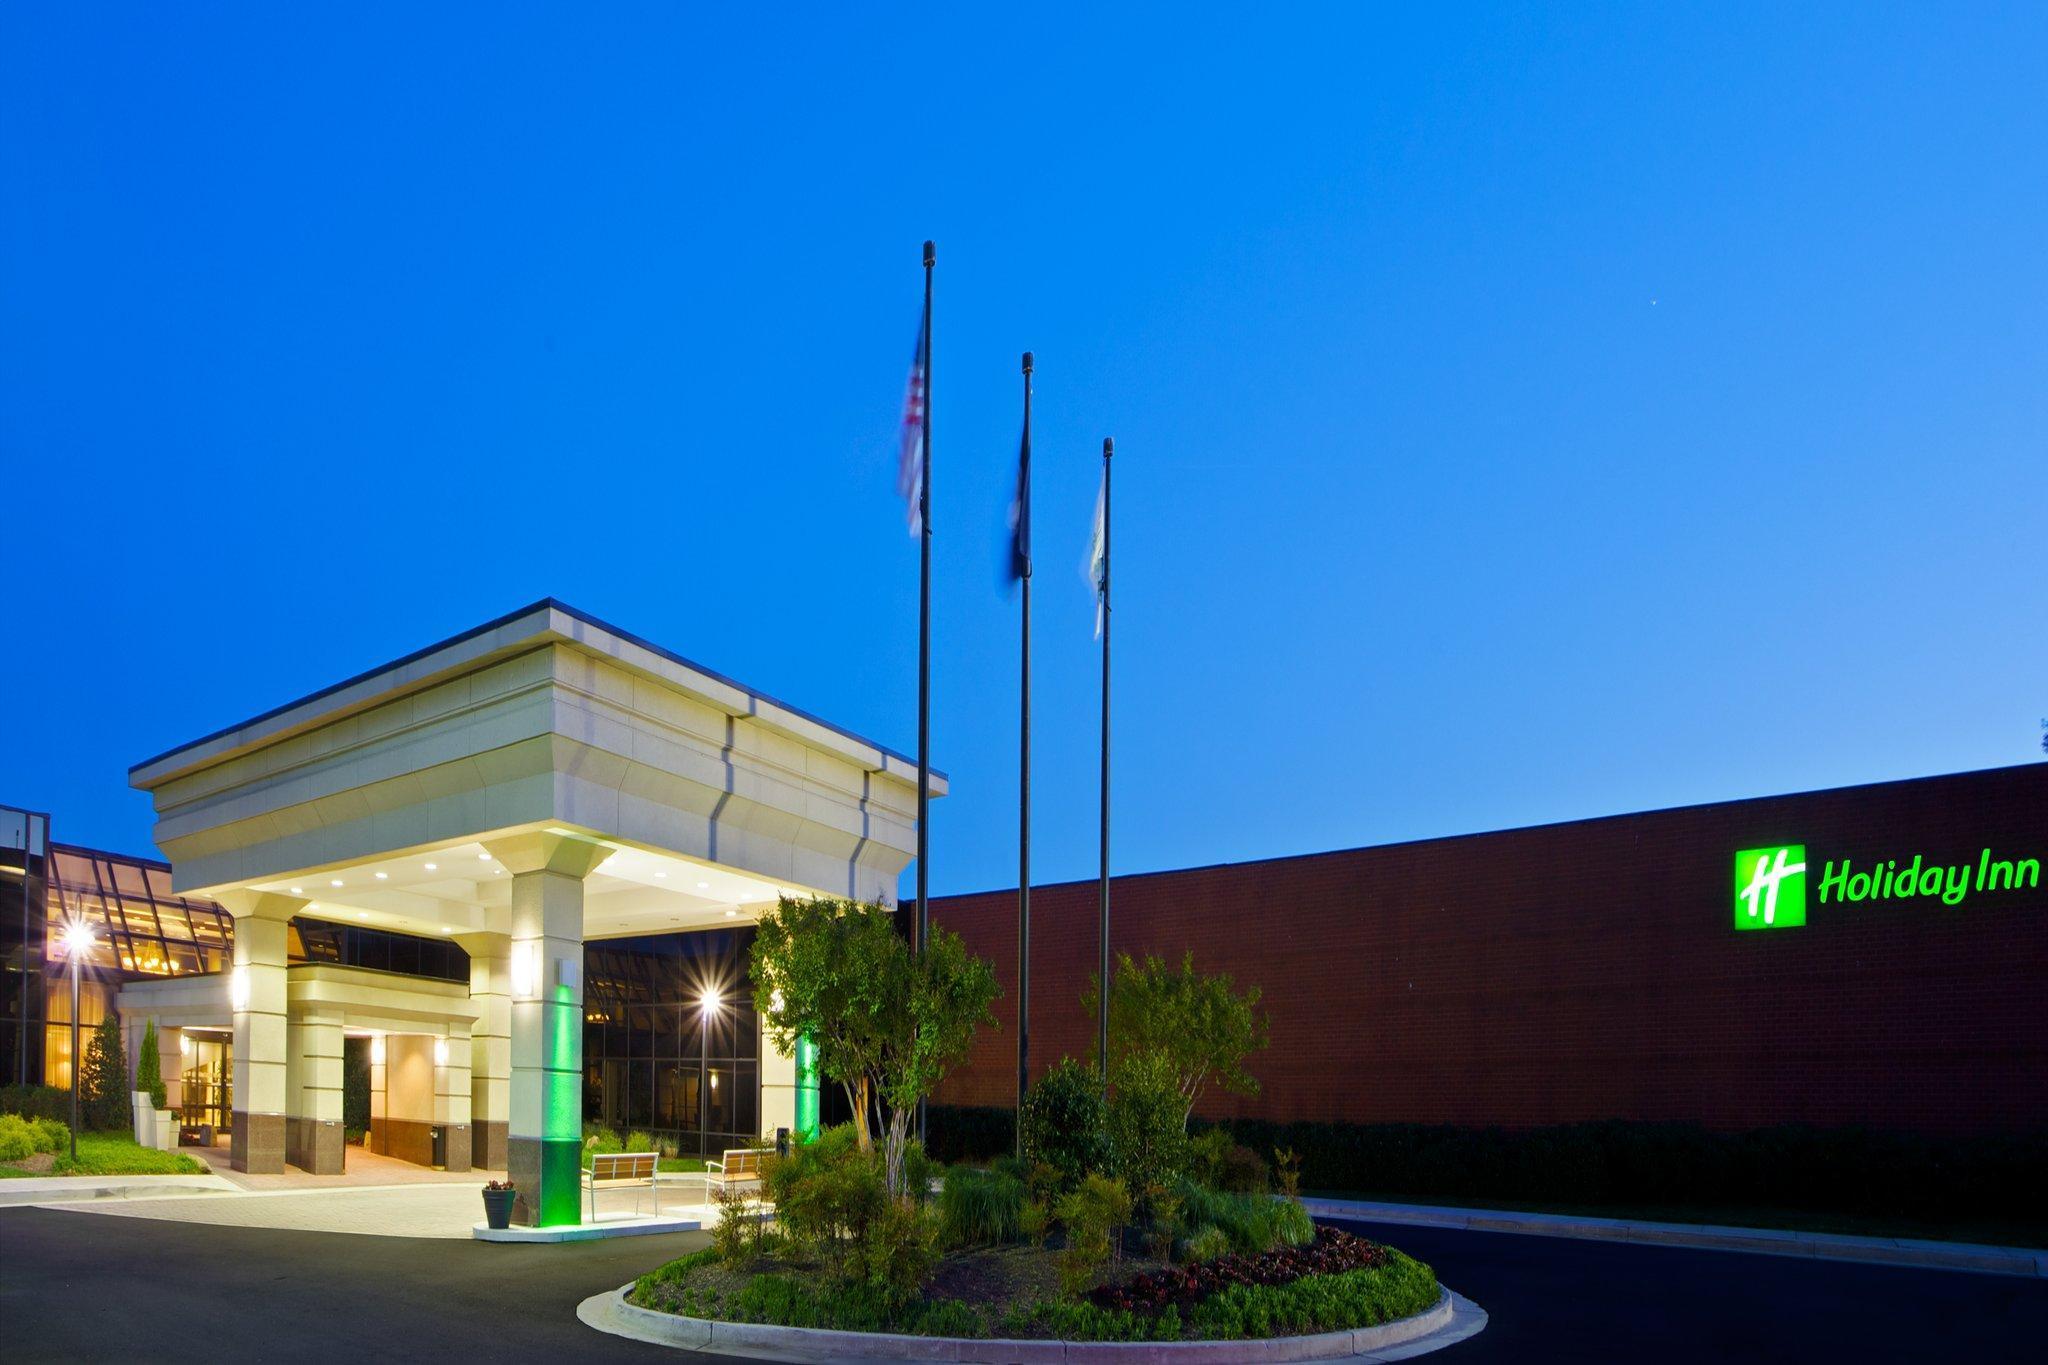 Holiday Inn Washington Dulles International Airport